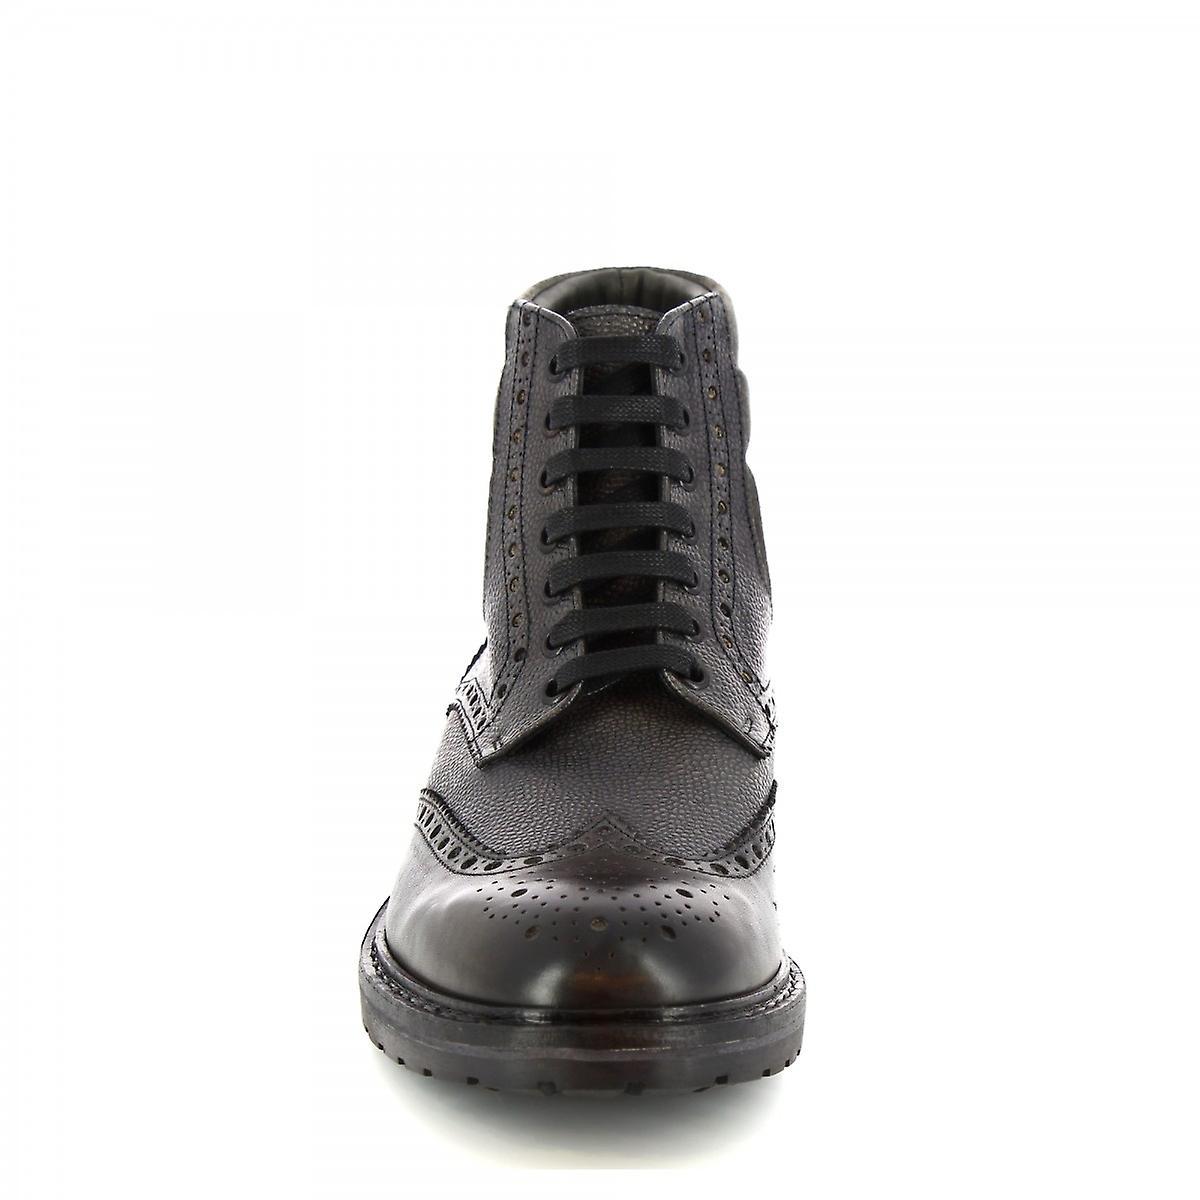 Leonardo Shoes Men's handmade lace-ups ankle boots gray leather crocodile print